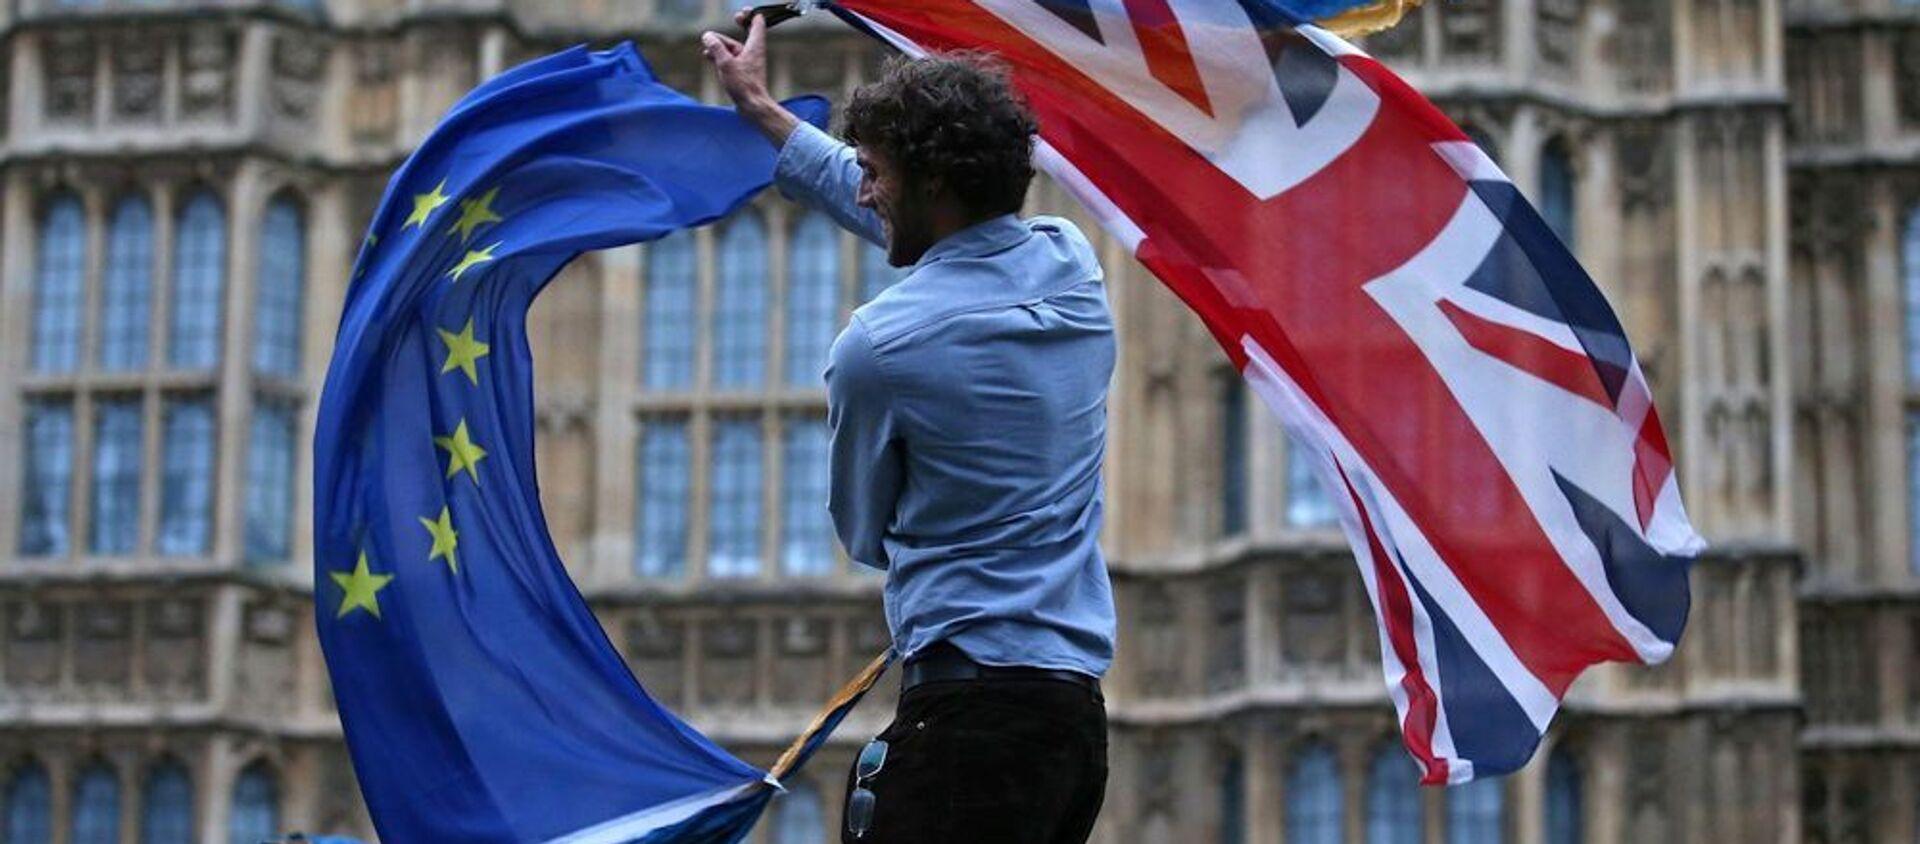 Мужчина машет флагом Союза и европейским флагом в центре Лондона, фото из архива - Sputnik Азербайджан, 1920, 25.01.2021